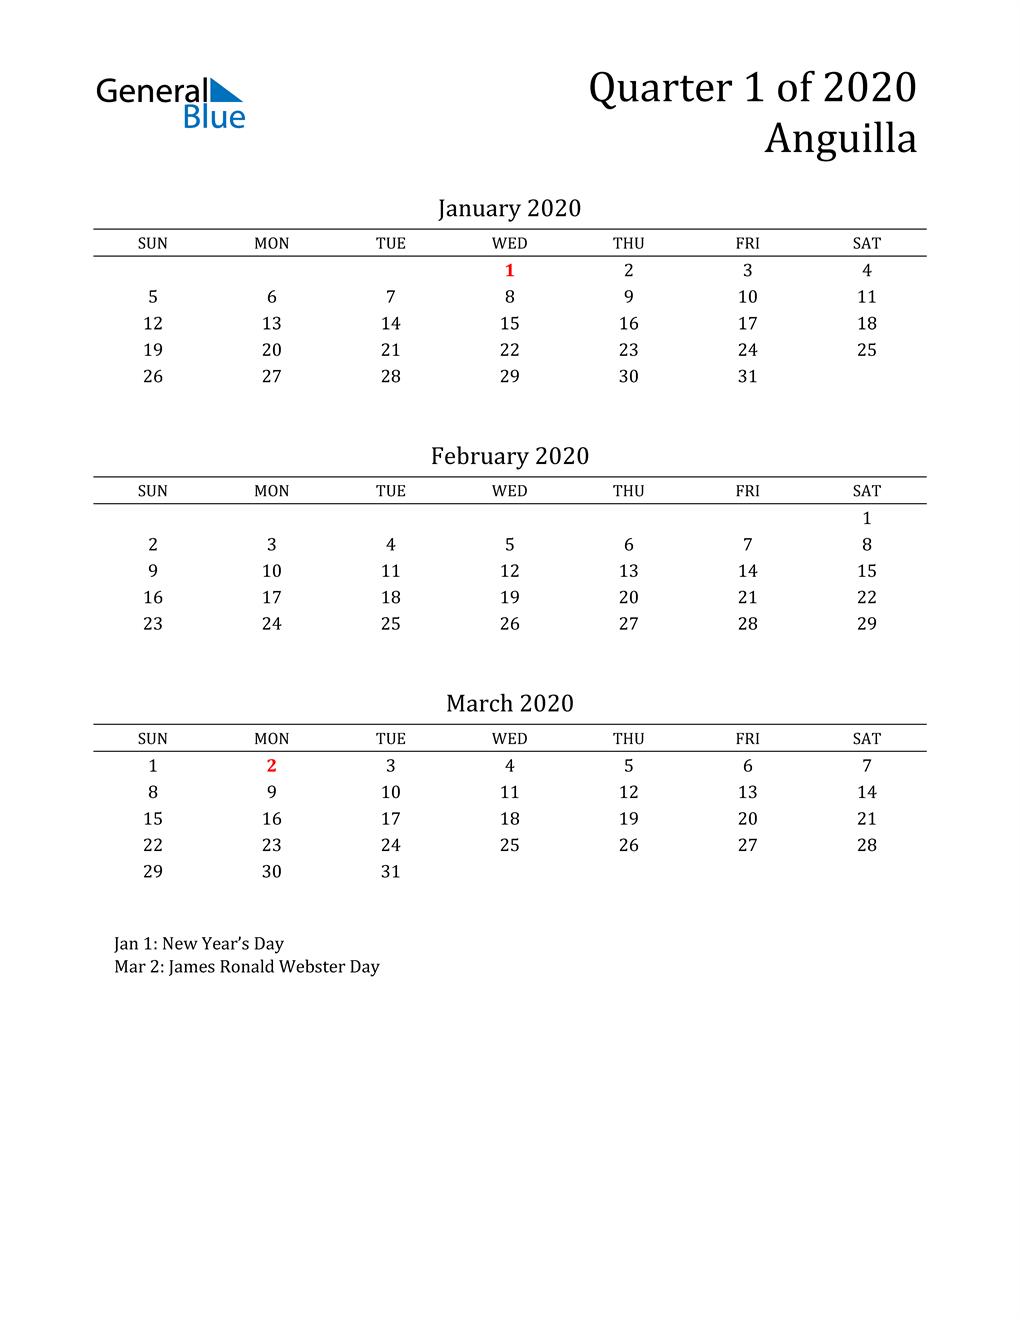 2020 Anguilla Quarterly Calendar